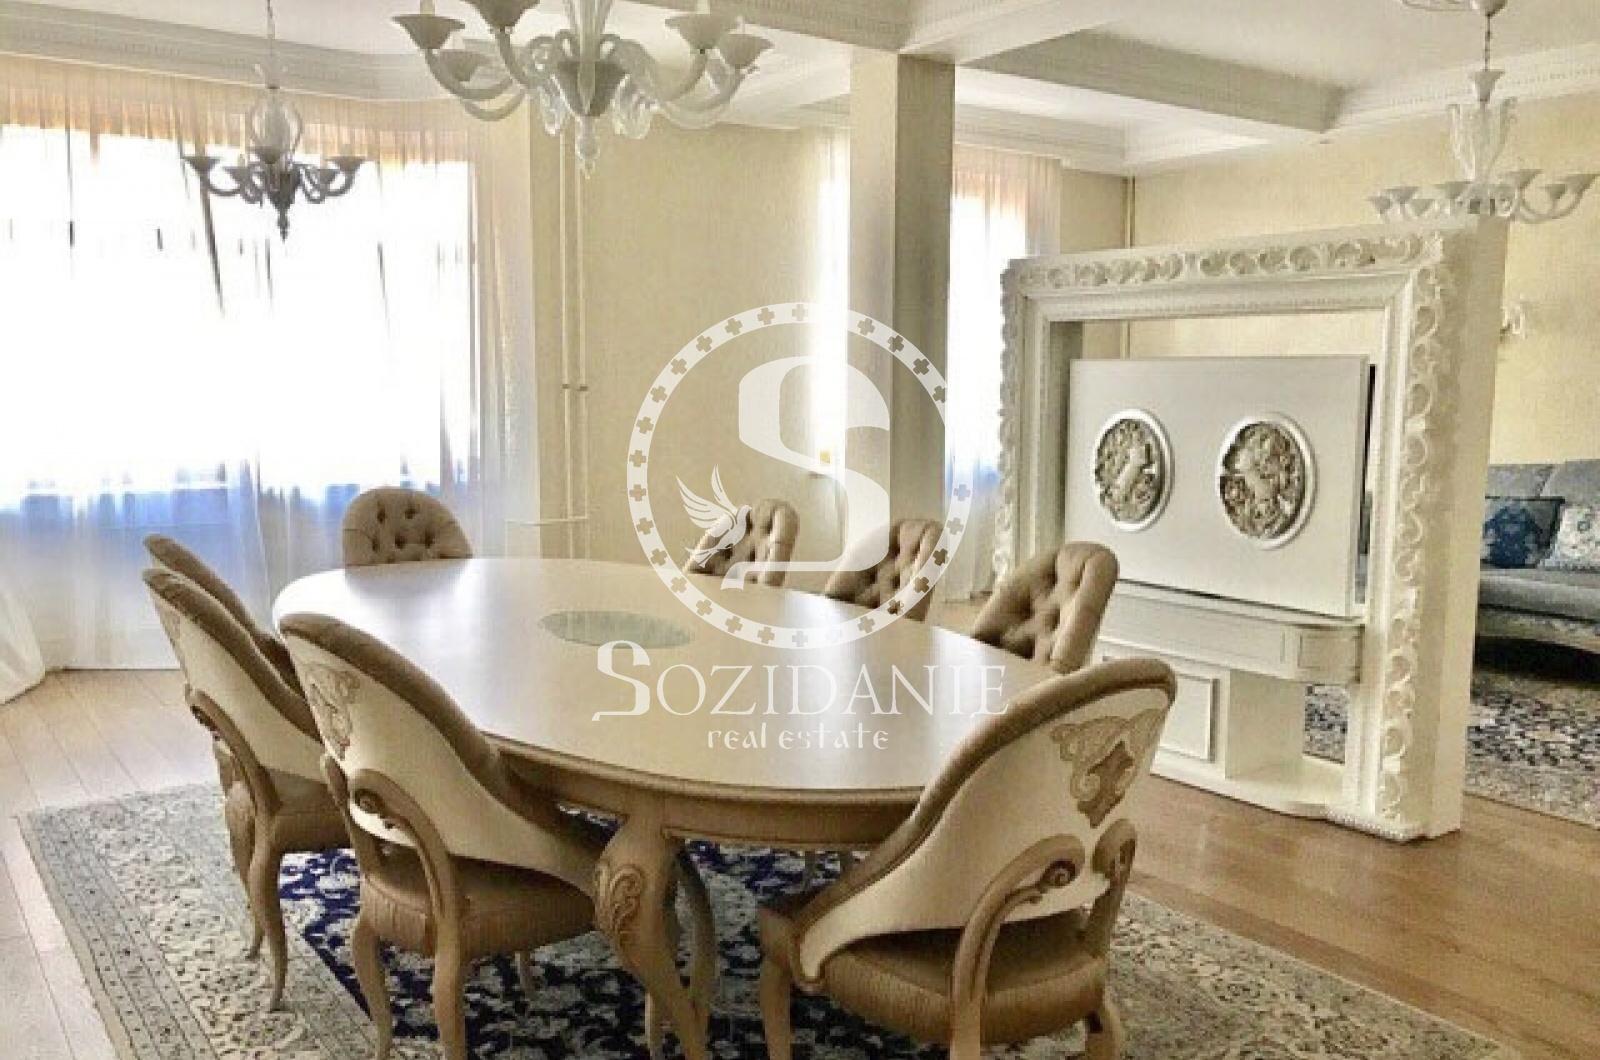 4 Комнаты, Городская, Аренда, 3-я Тверская-Ямская, Listing ID 3599, Москва, Россия,